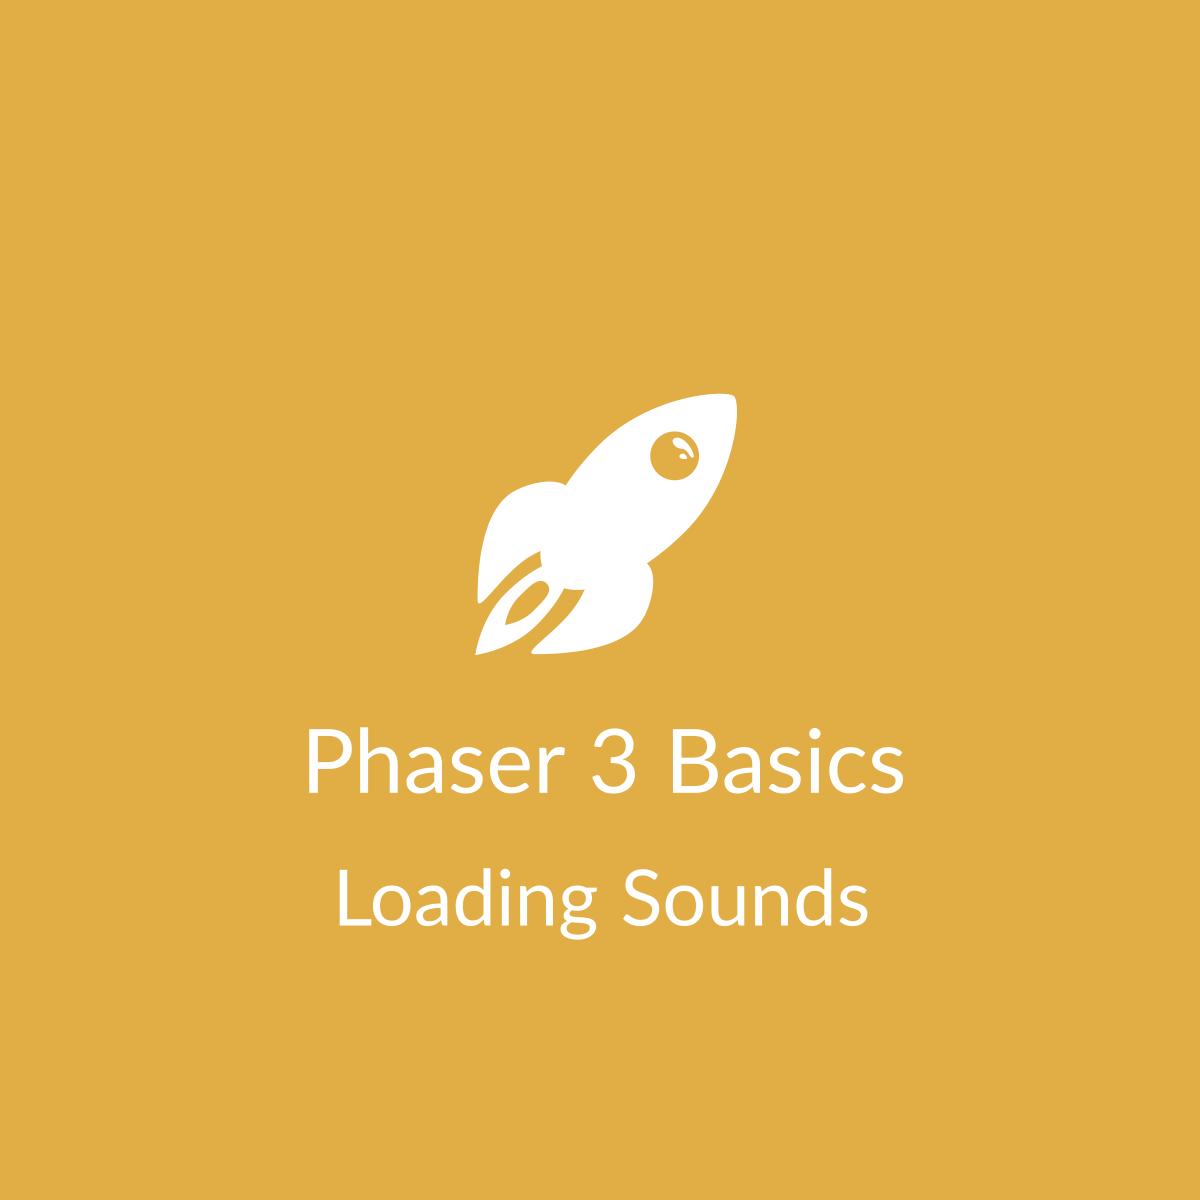 Phaser 3 Basics: Loading Sounds